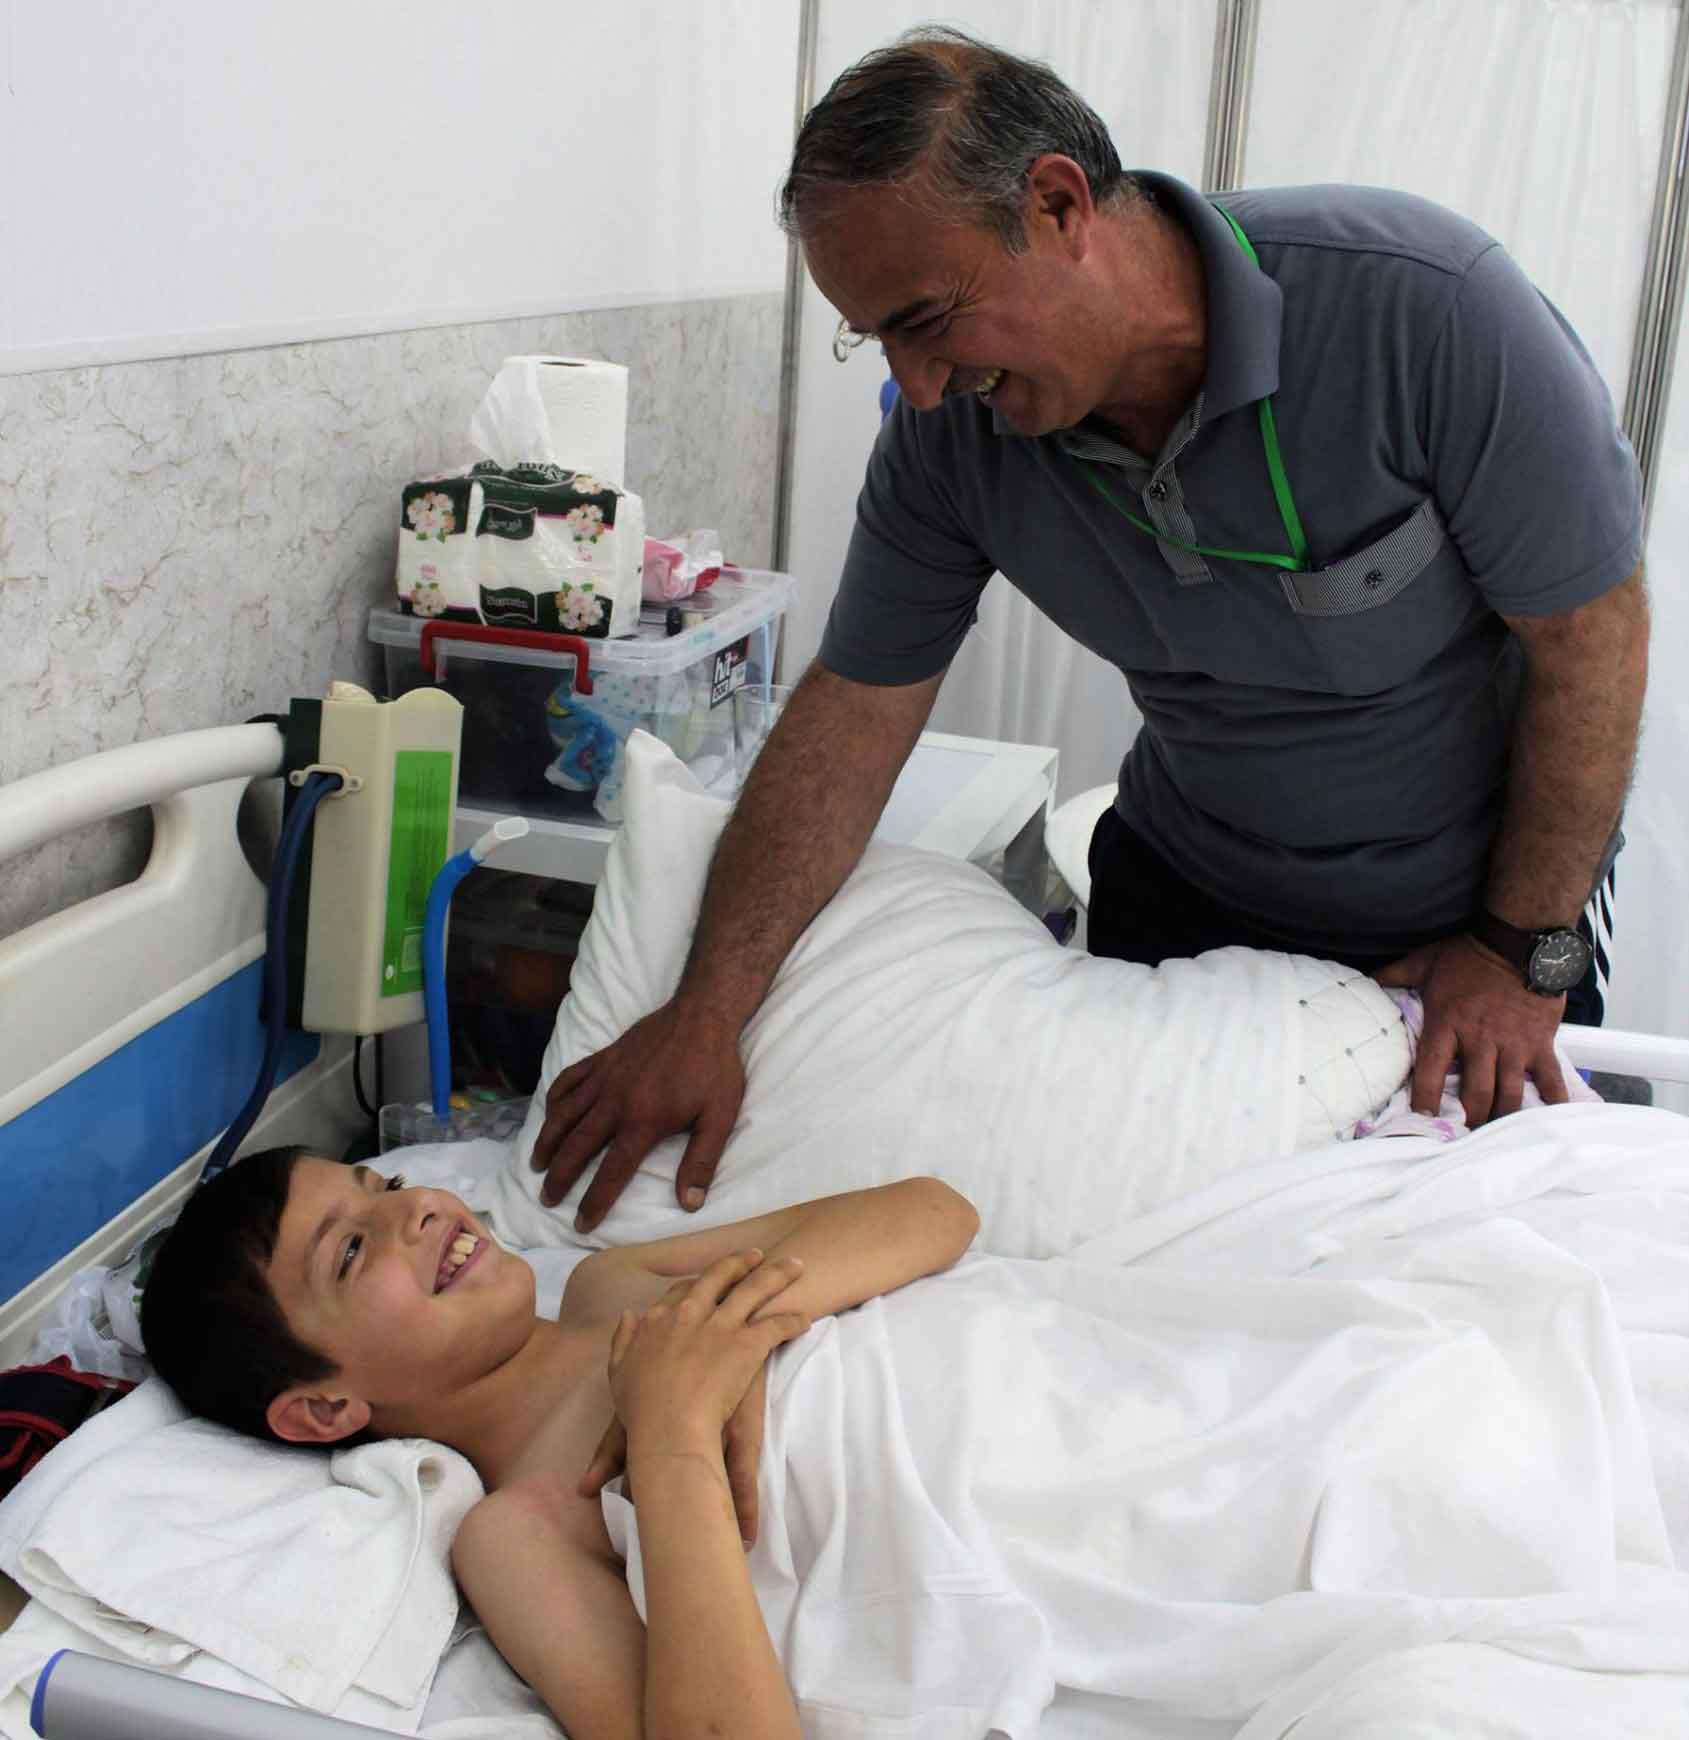 Rayyan (12 years old), war victim, it the Emergency Hospital ward. His father is near him.